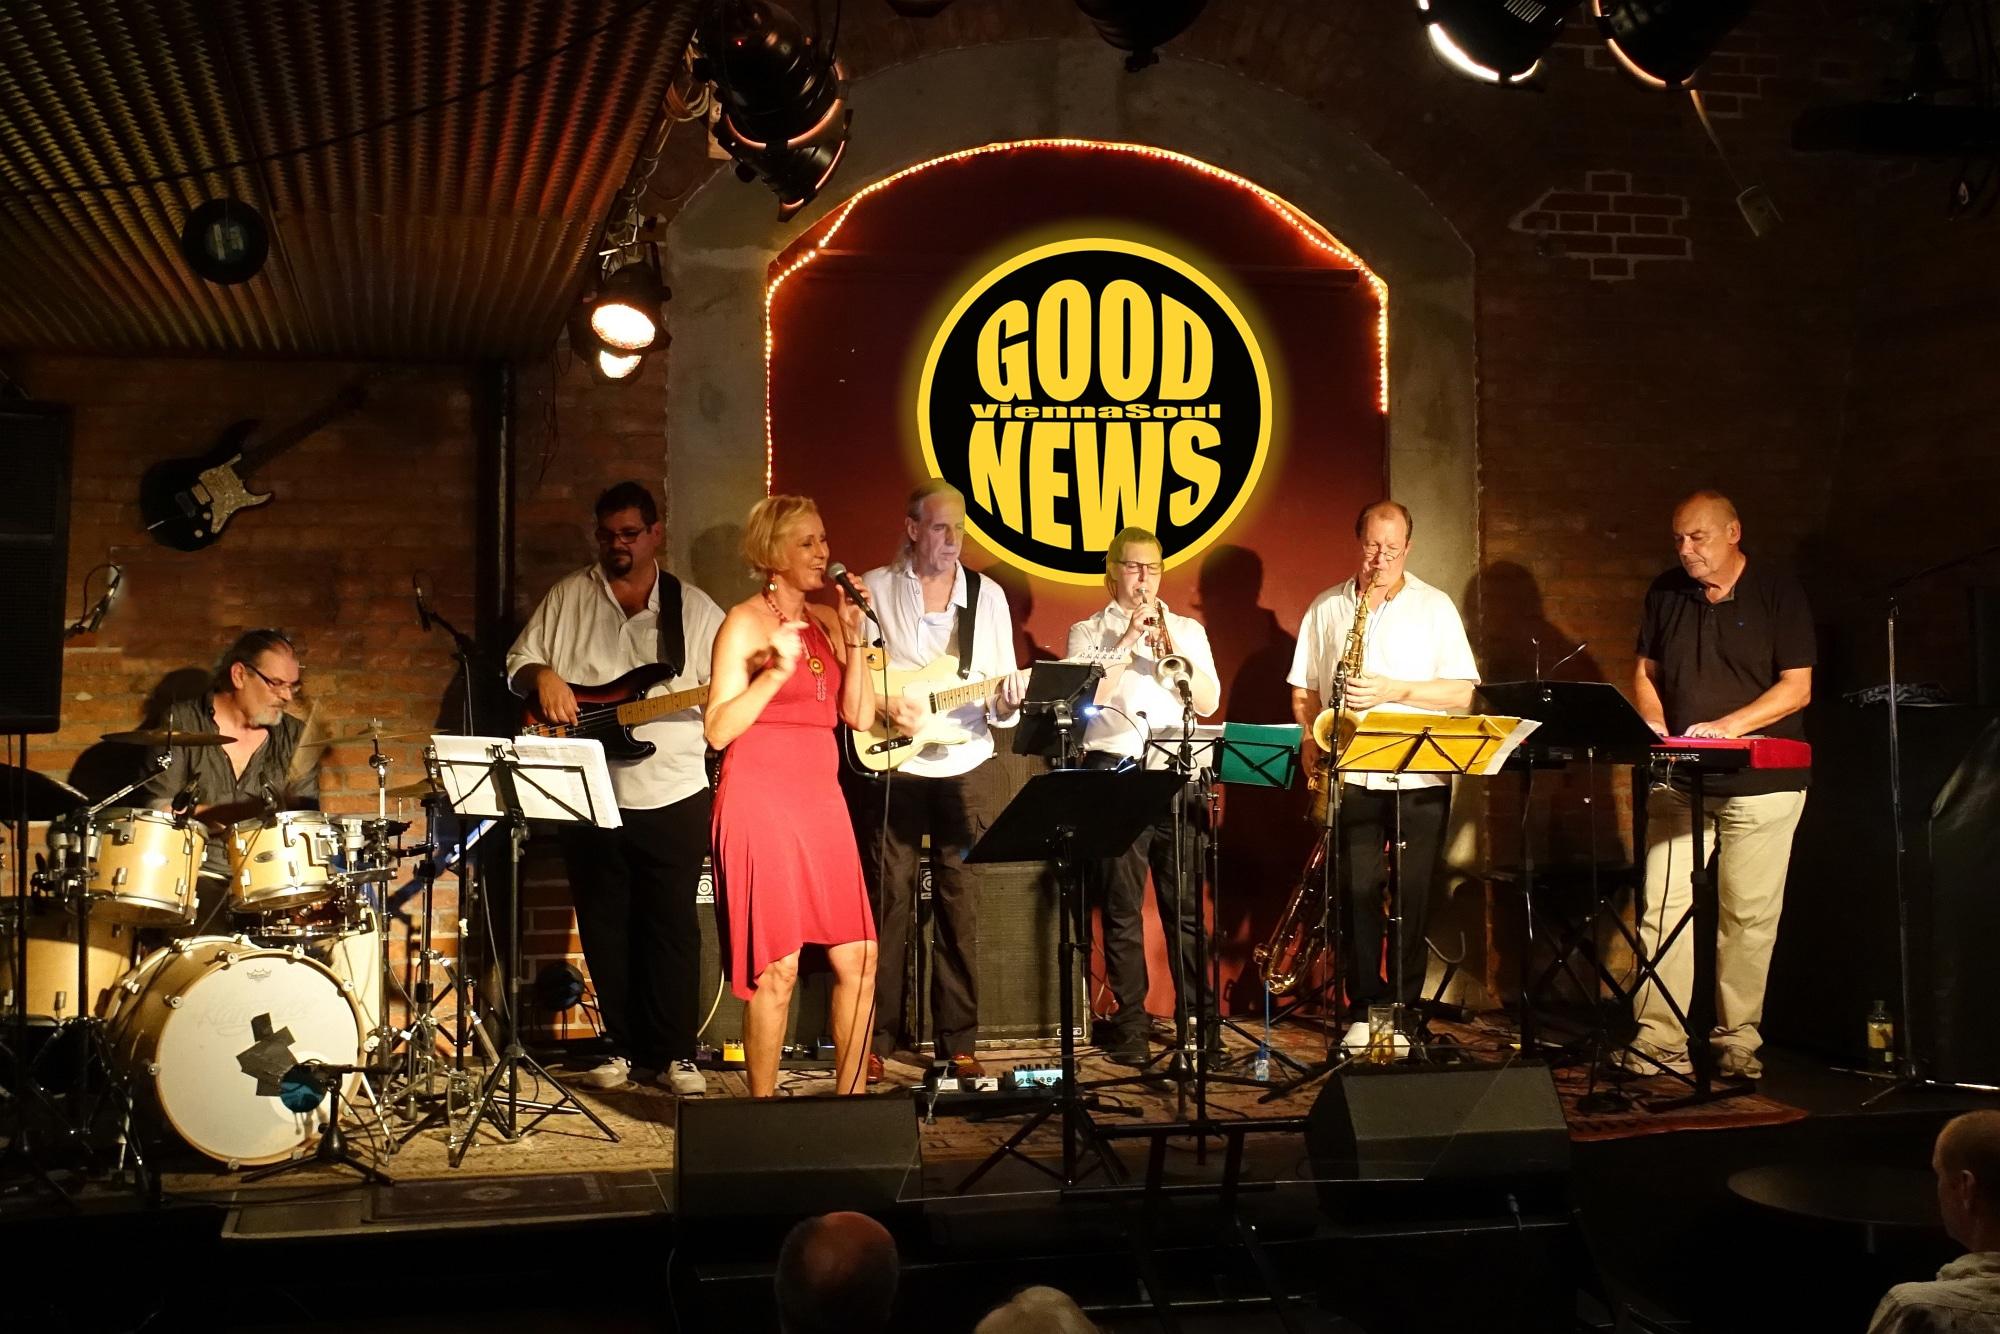 babüspace Summer Edition: Good news - vienna soul